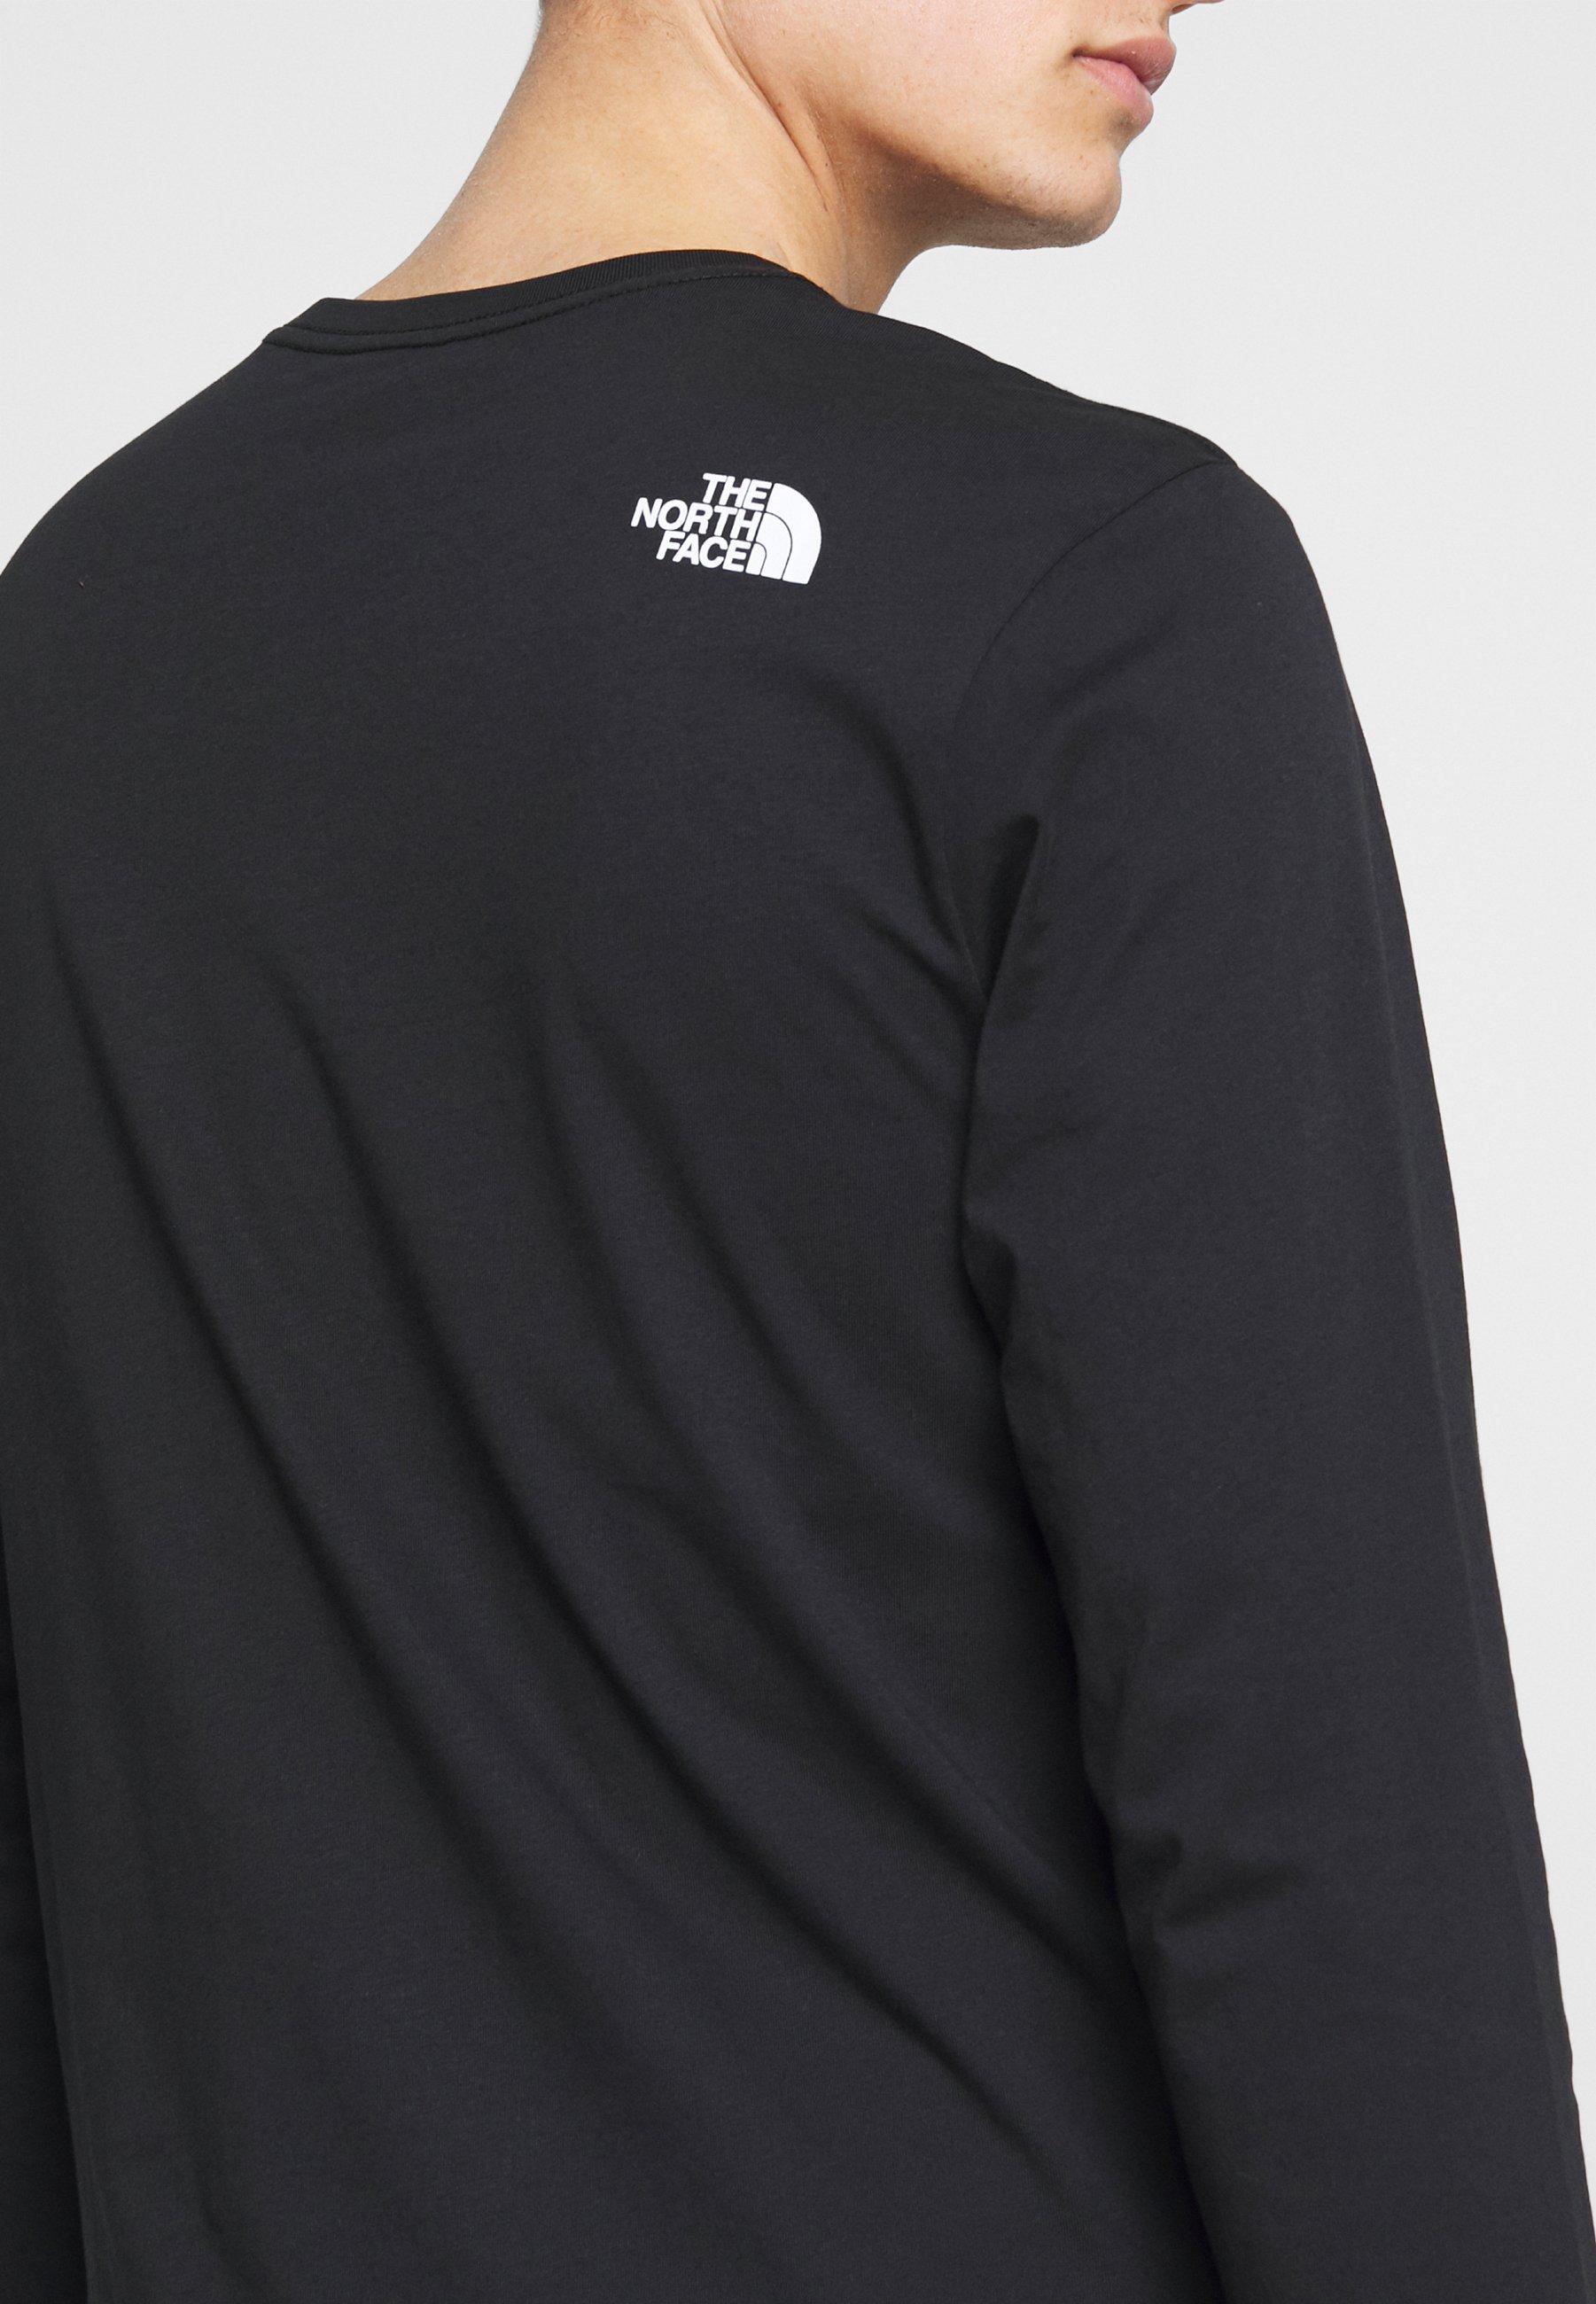 The North Face Mens Graphic Tee - Maglietta A Manica Lunga Black/white MadY9